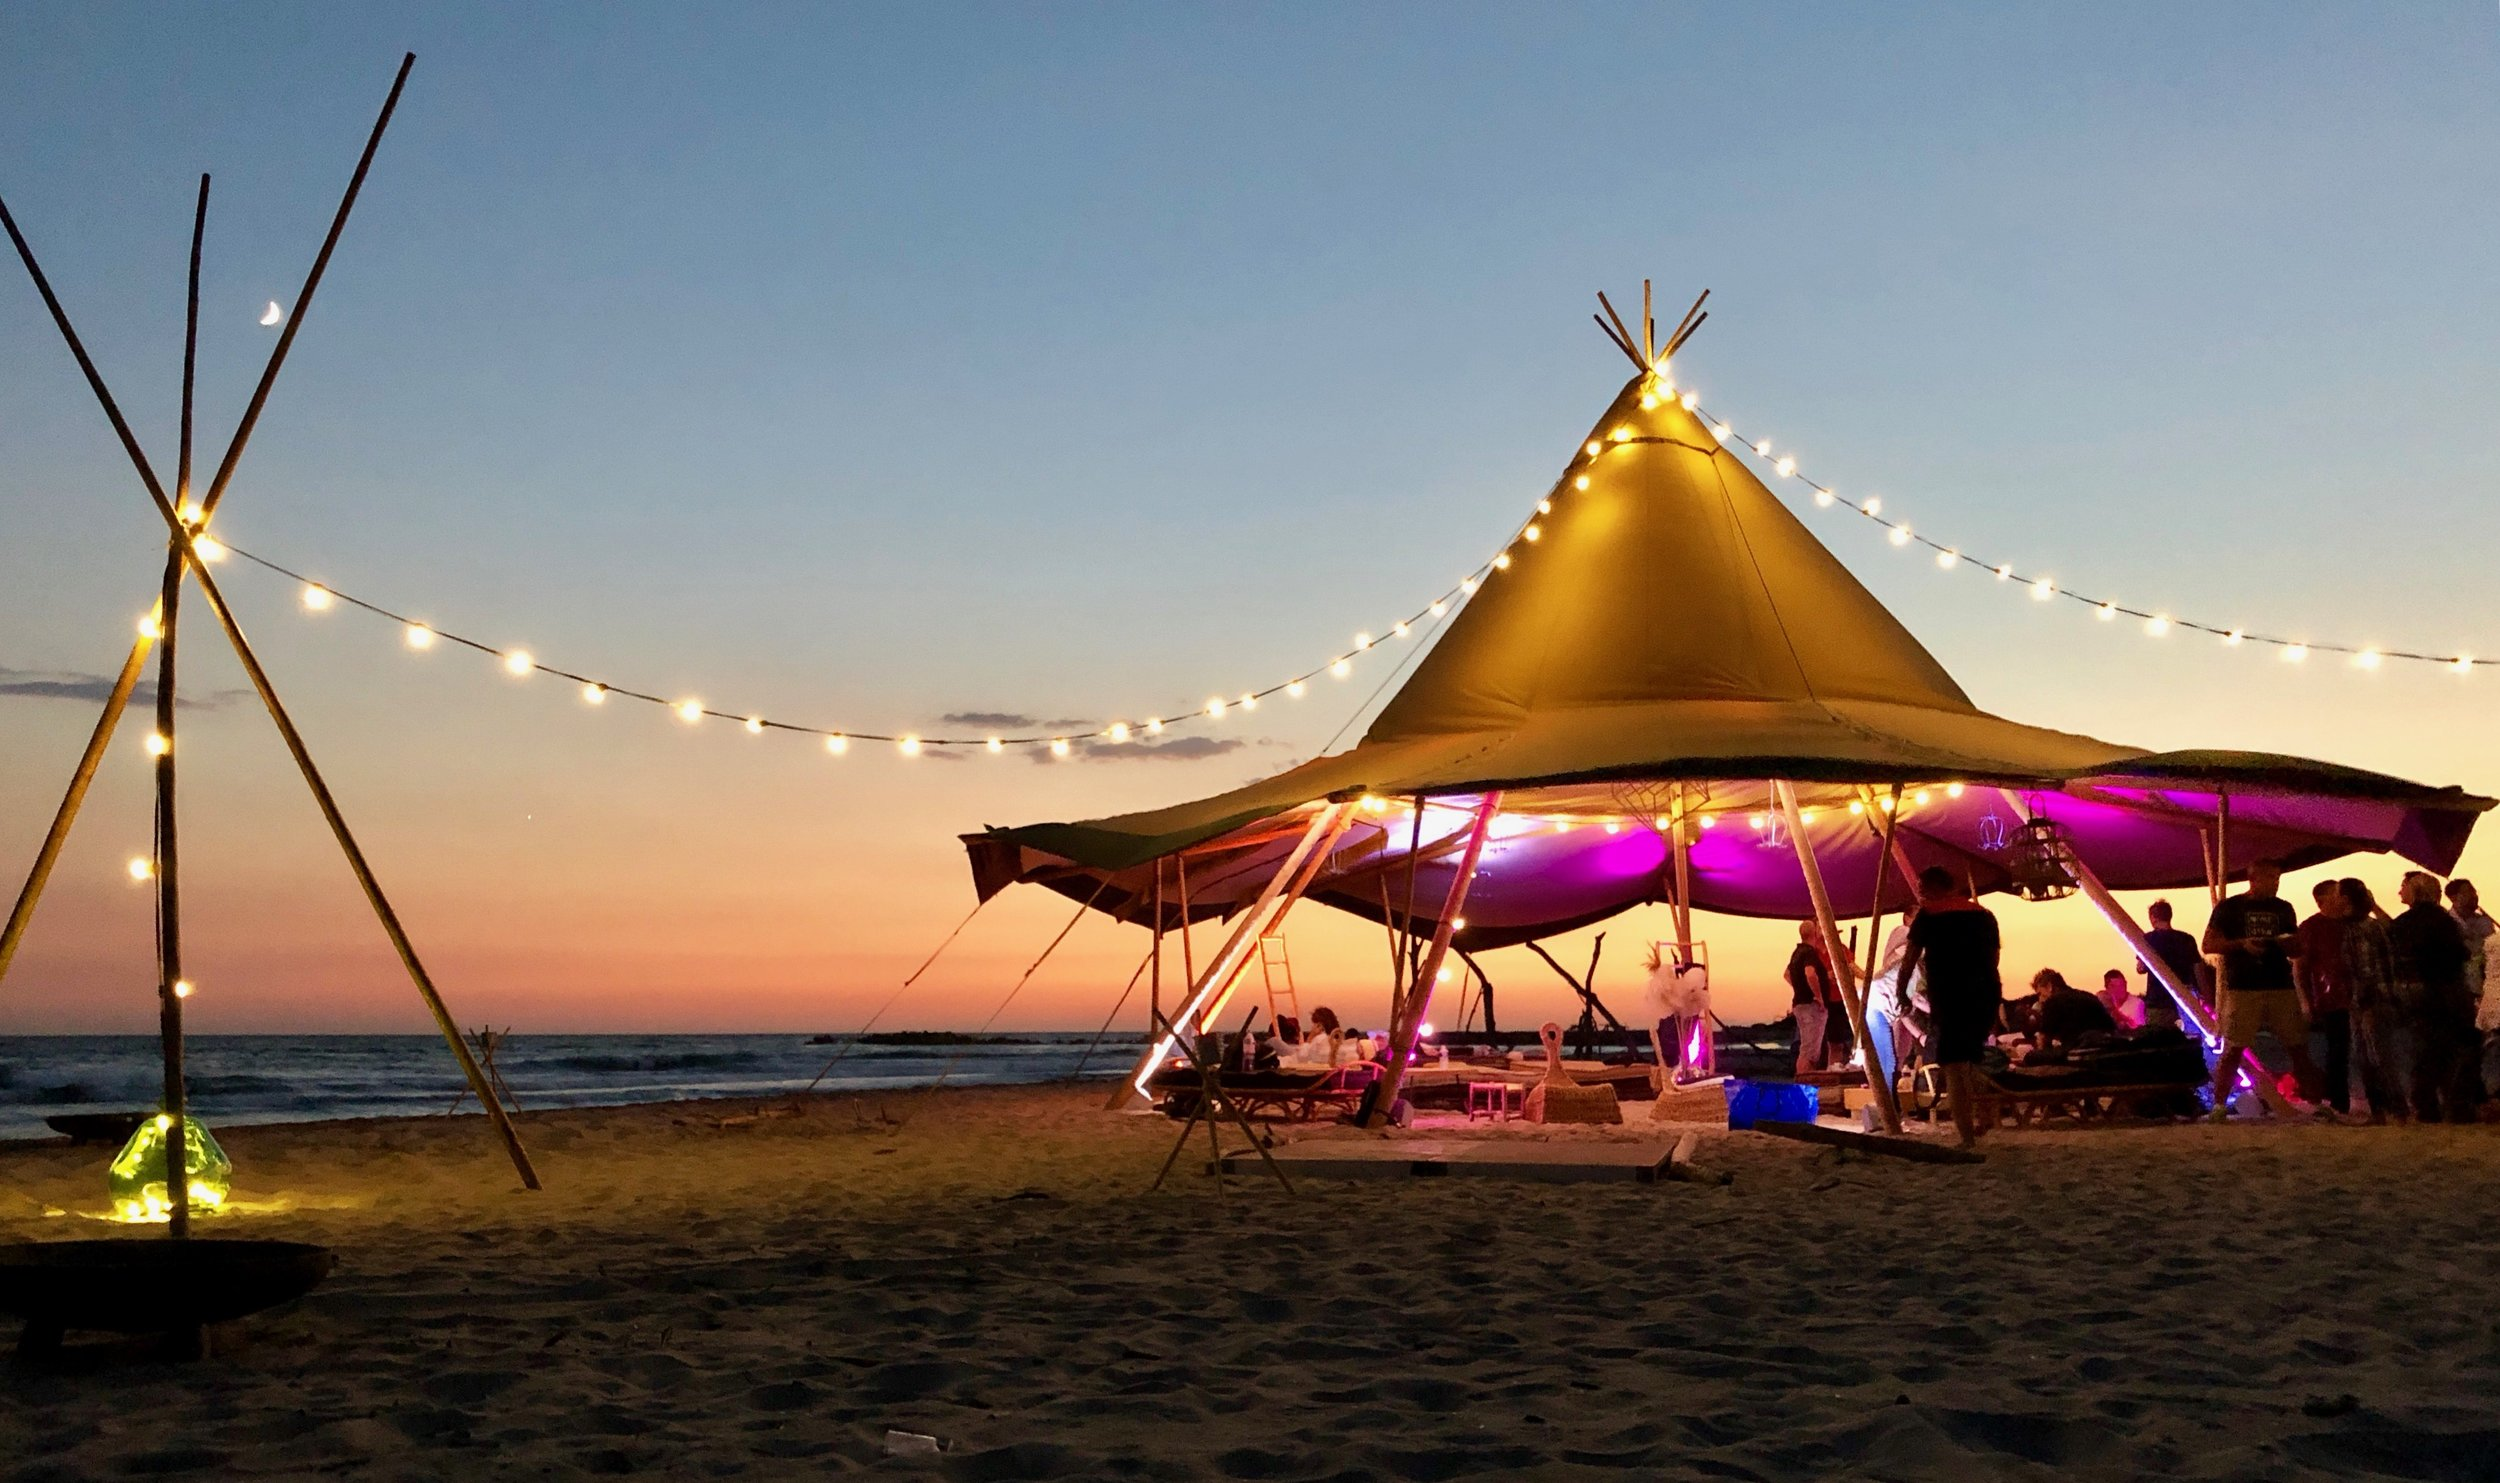 wedding hire , mobilier mariage , camargue wedding  , south of France wedding , provence wedding , luberon wedding , Mediterranean wedding